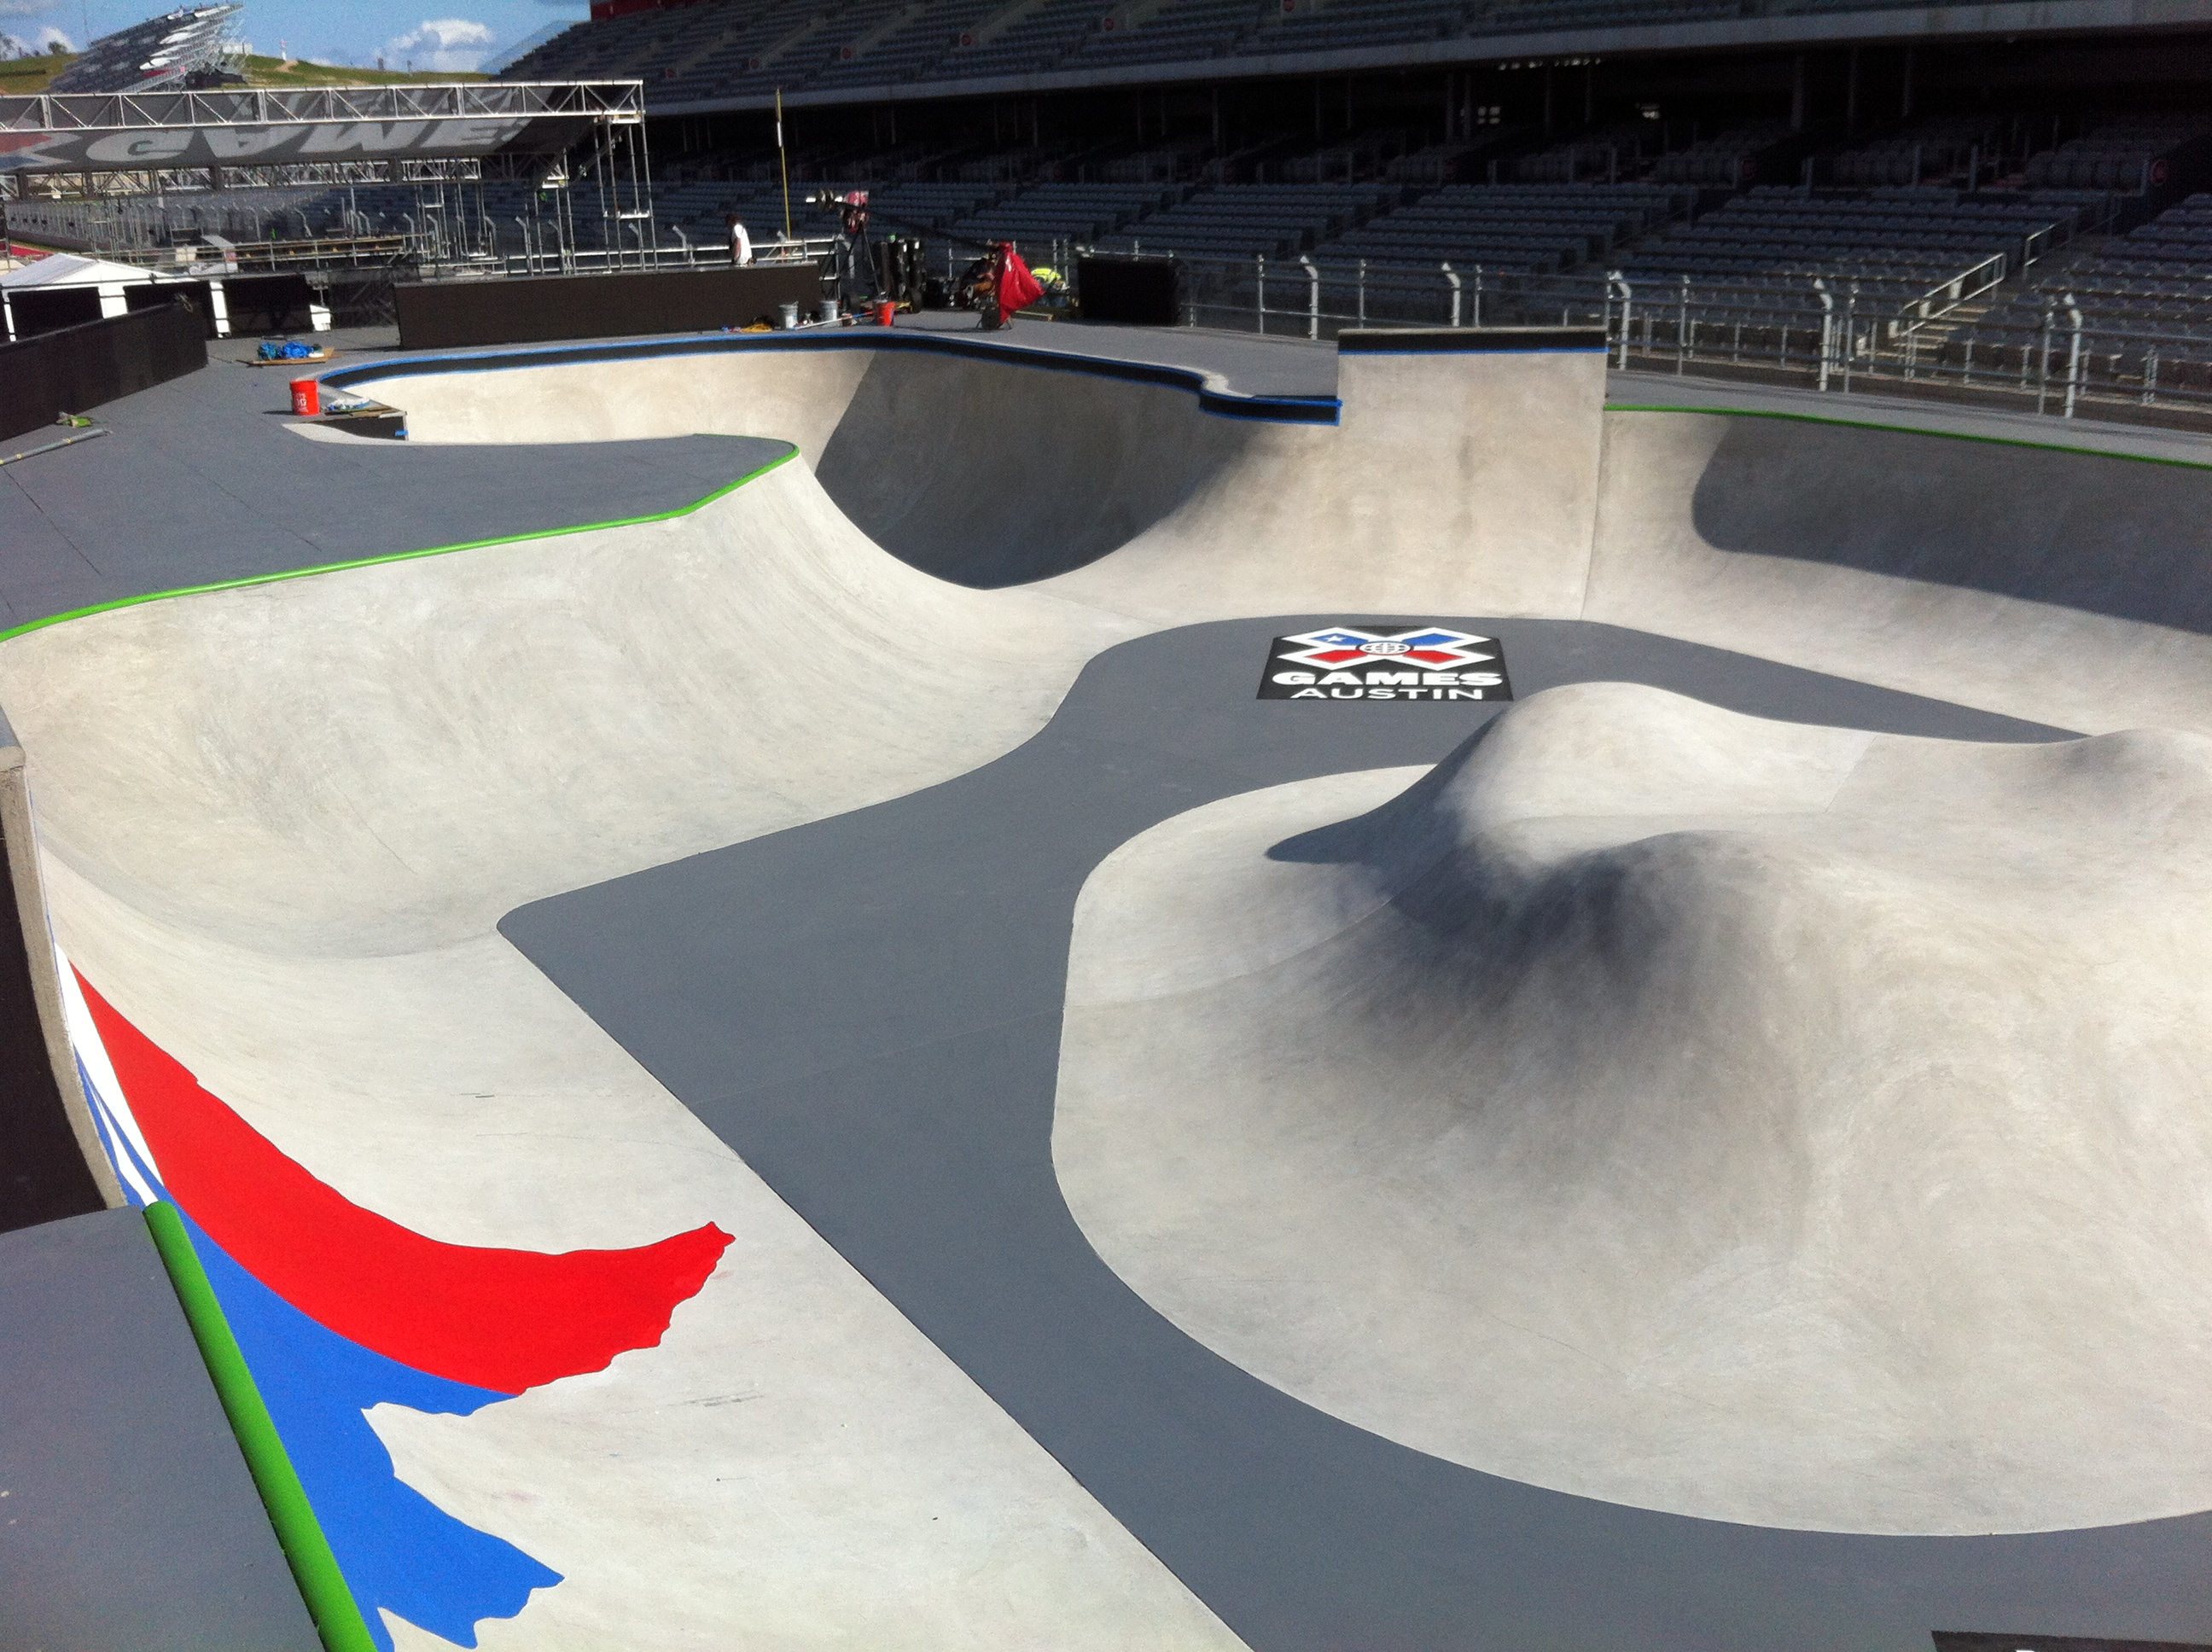 X Games Austin 2014